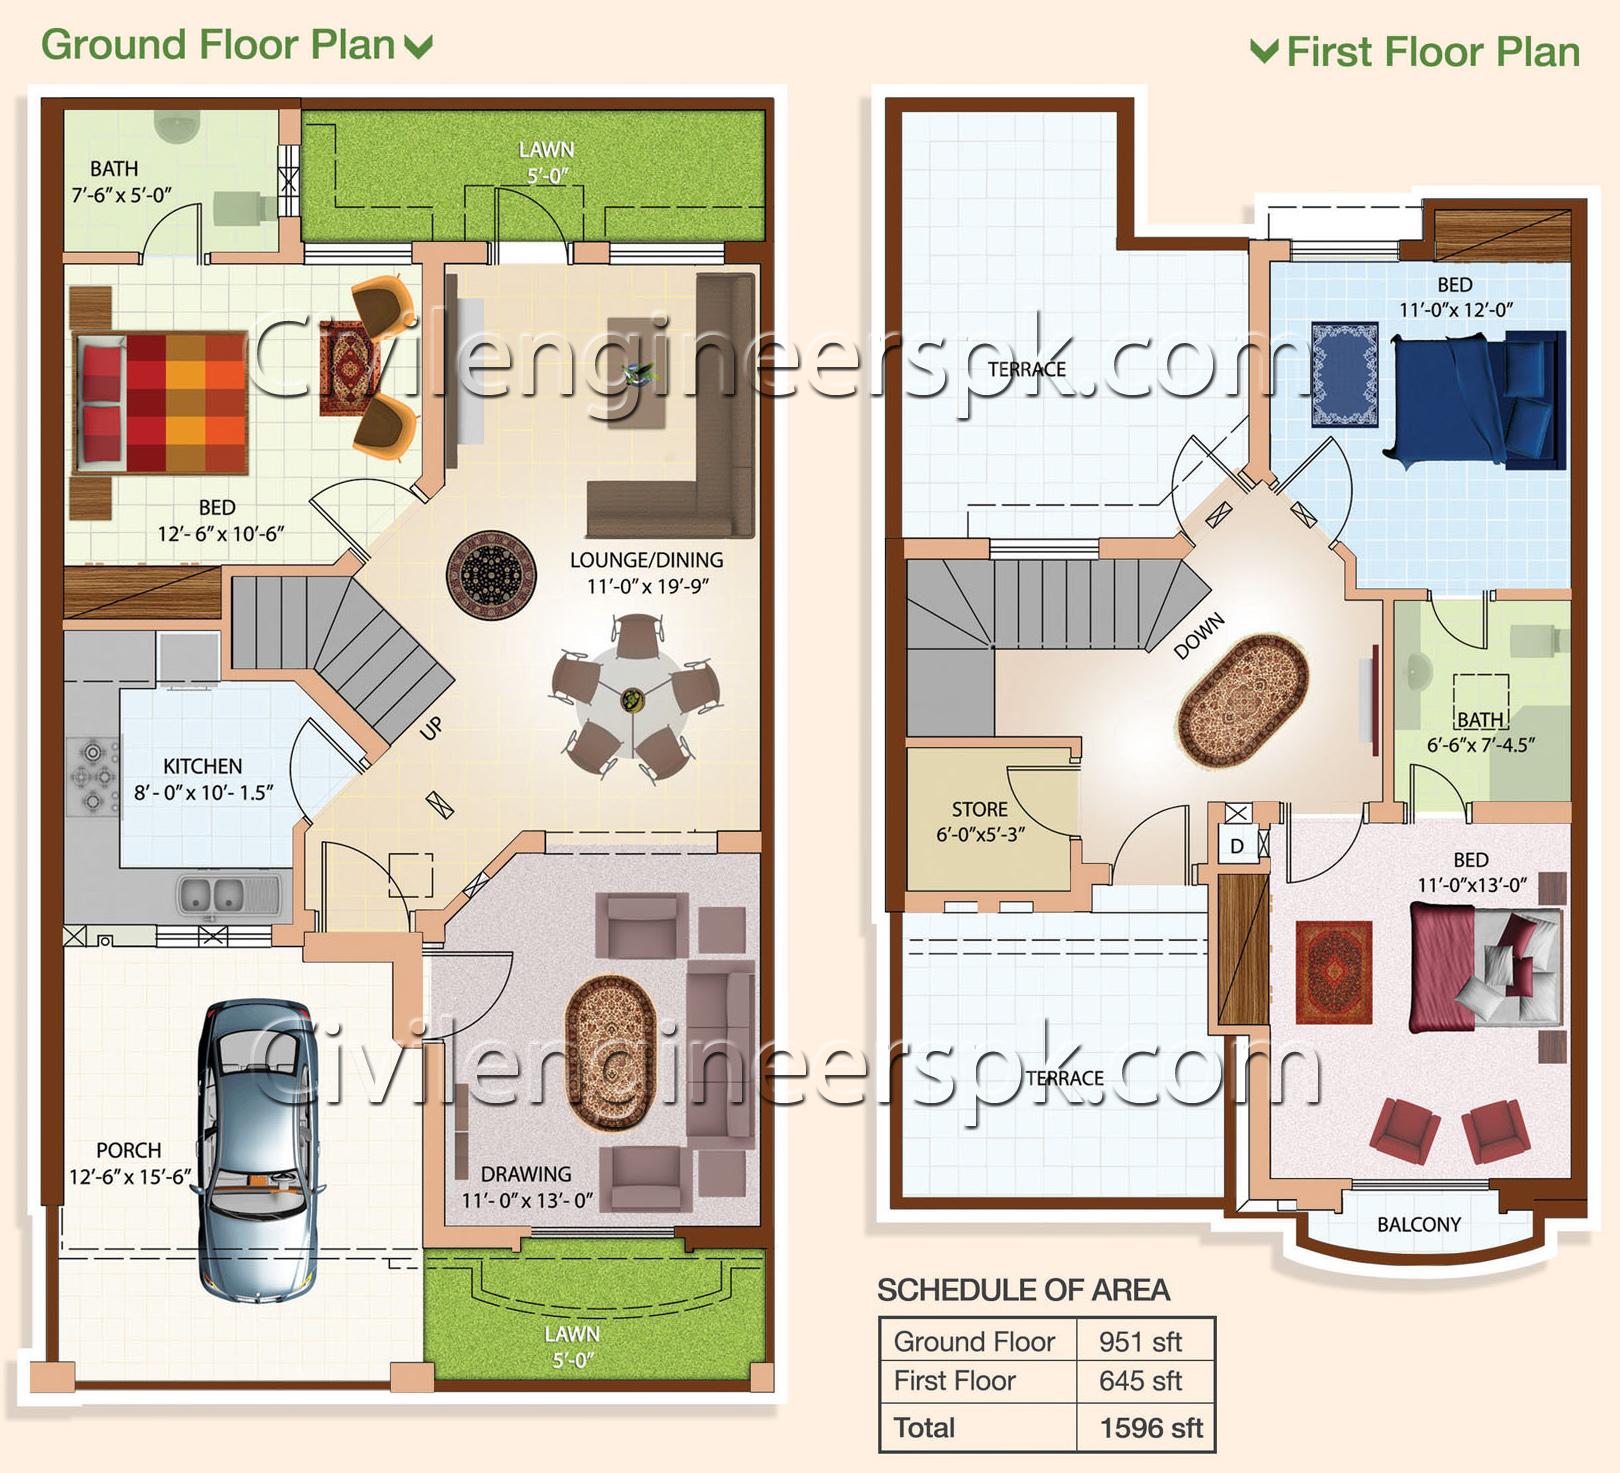 5 Marla House Plan Elevation Architecture Design: Civil Engineers PK